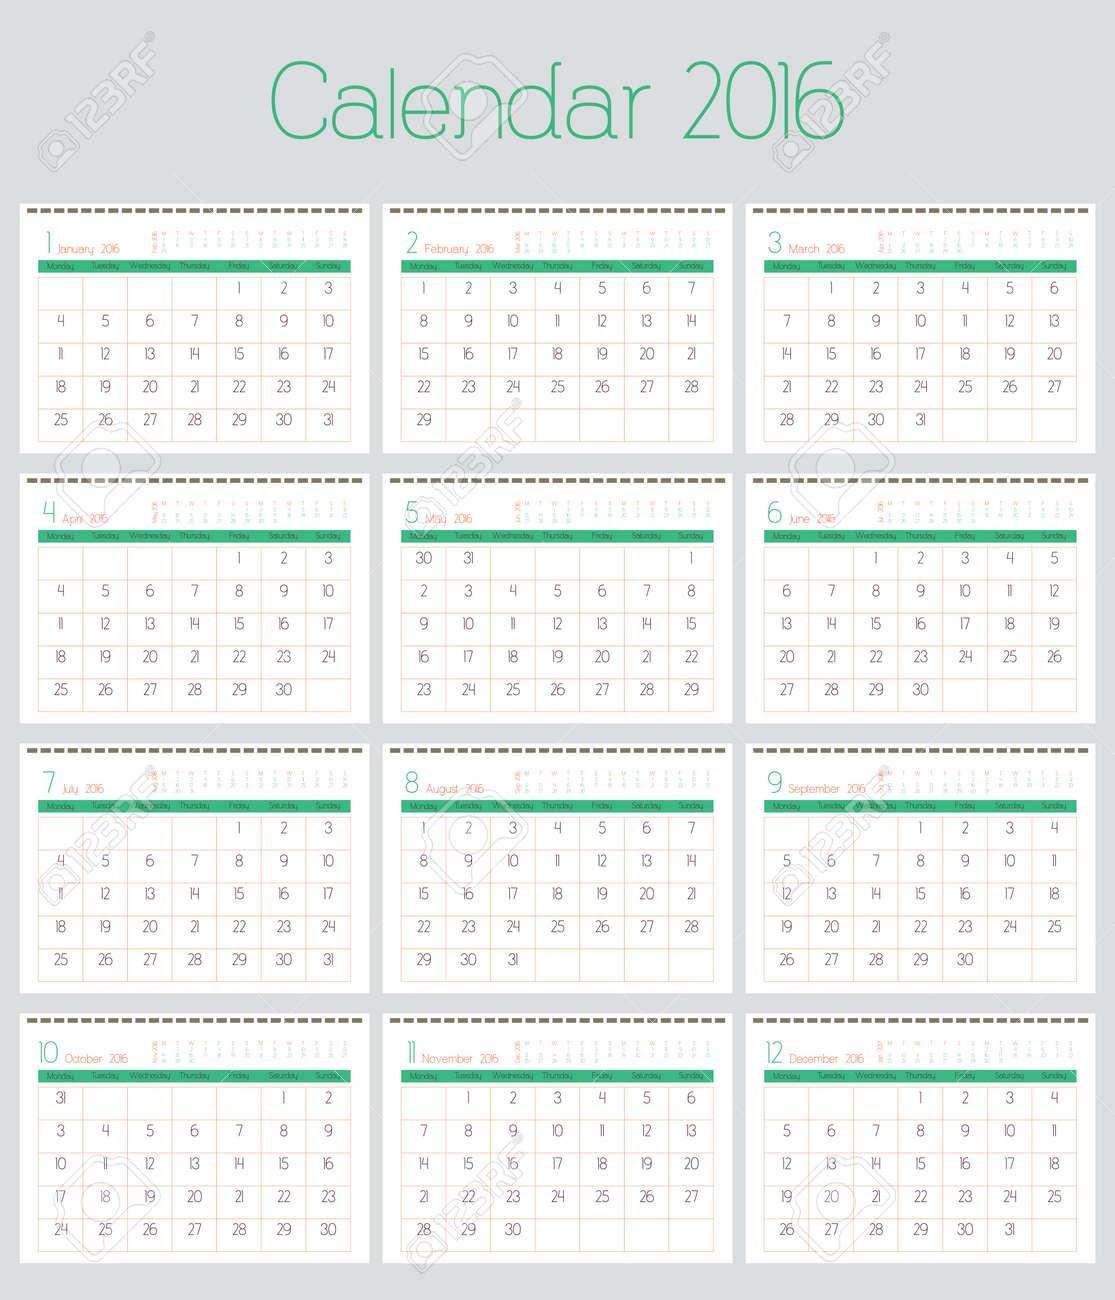 poster calendar for 2016 simple vector design print template